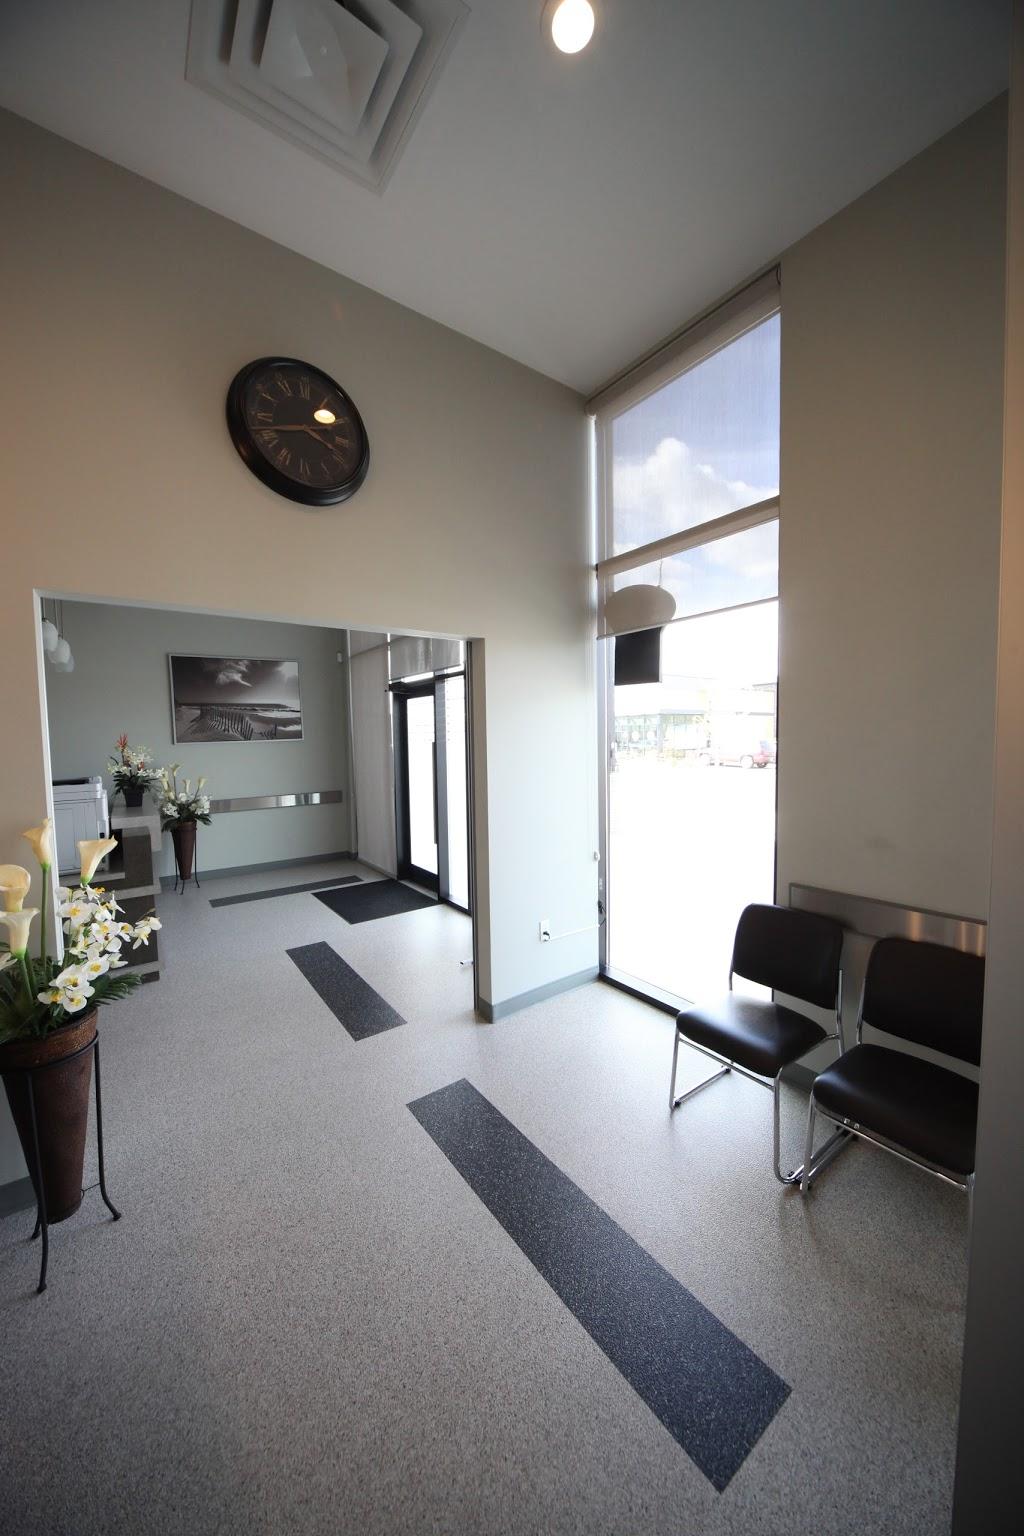 Gracepoint Medical Clinics | doctor | 6823 Ellerslie Rd SW, Edmonton, AB T6X 1L1, Canada | 7807059944 OR +1 780-705-9944